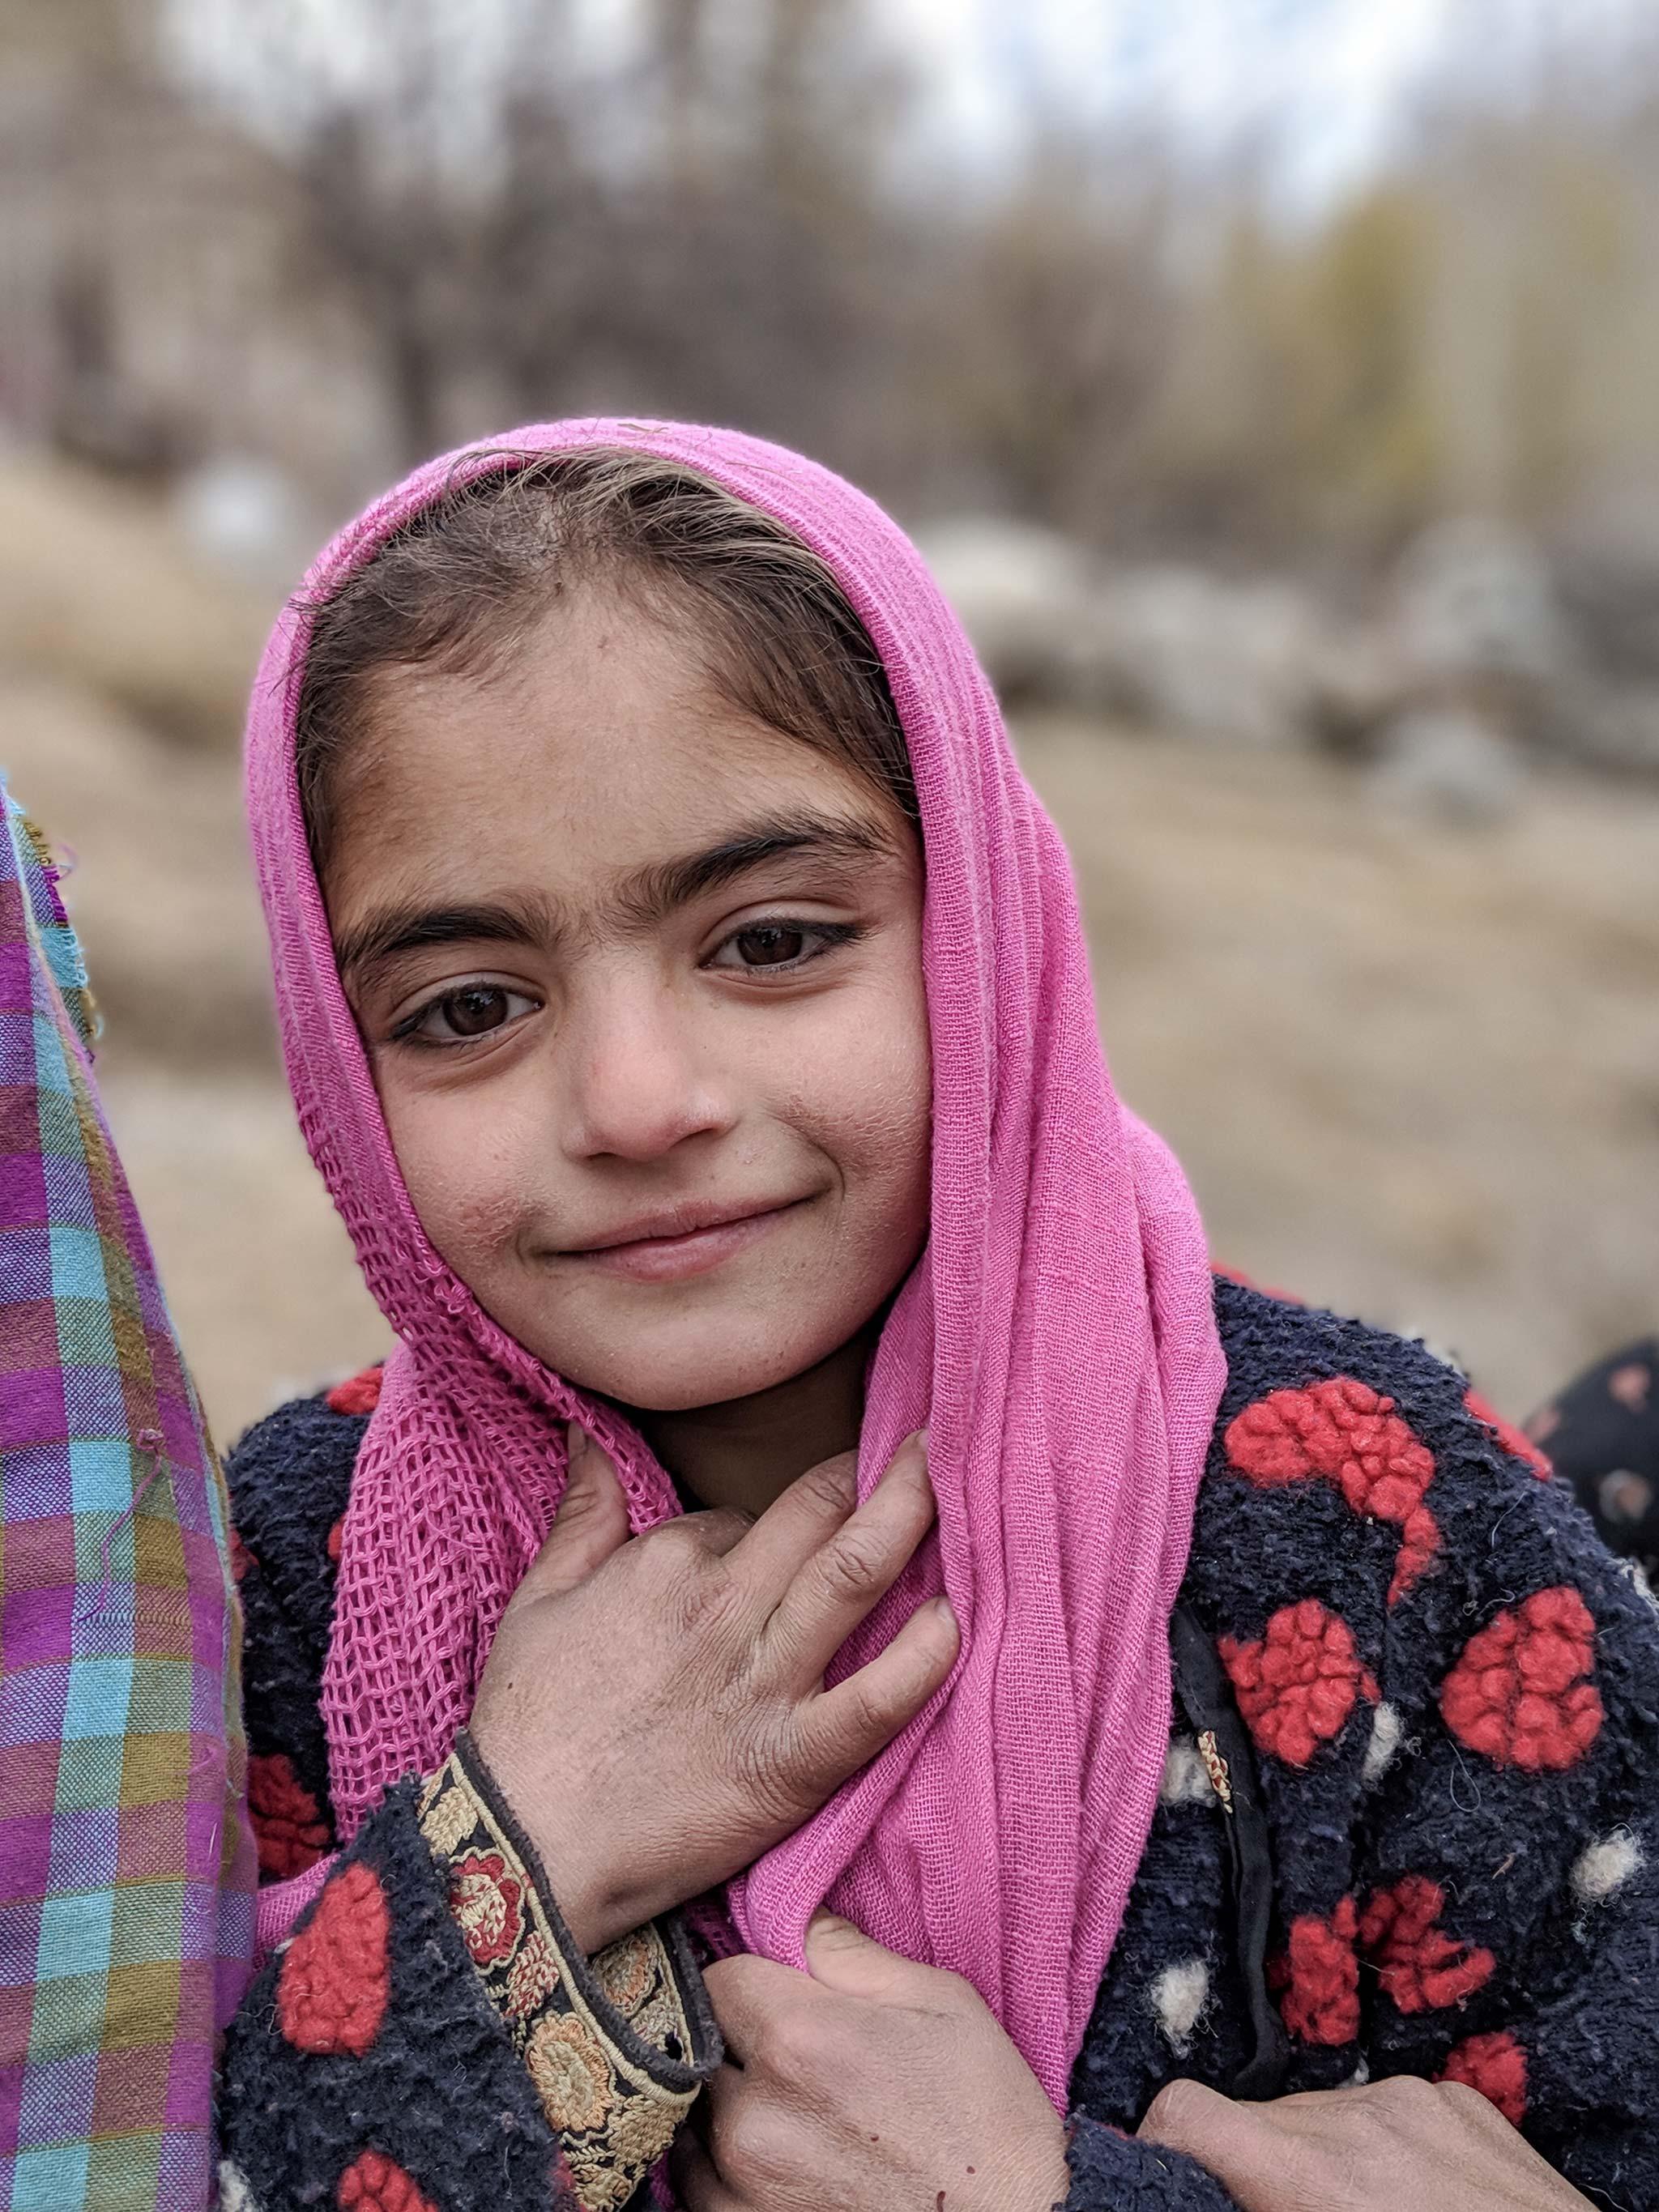 Pakistan's-Eyes-42.jpg